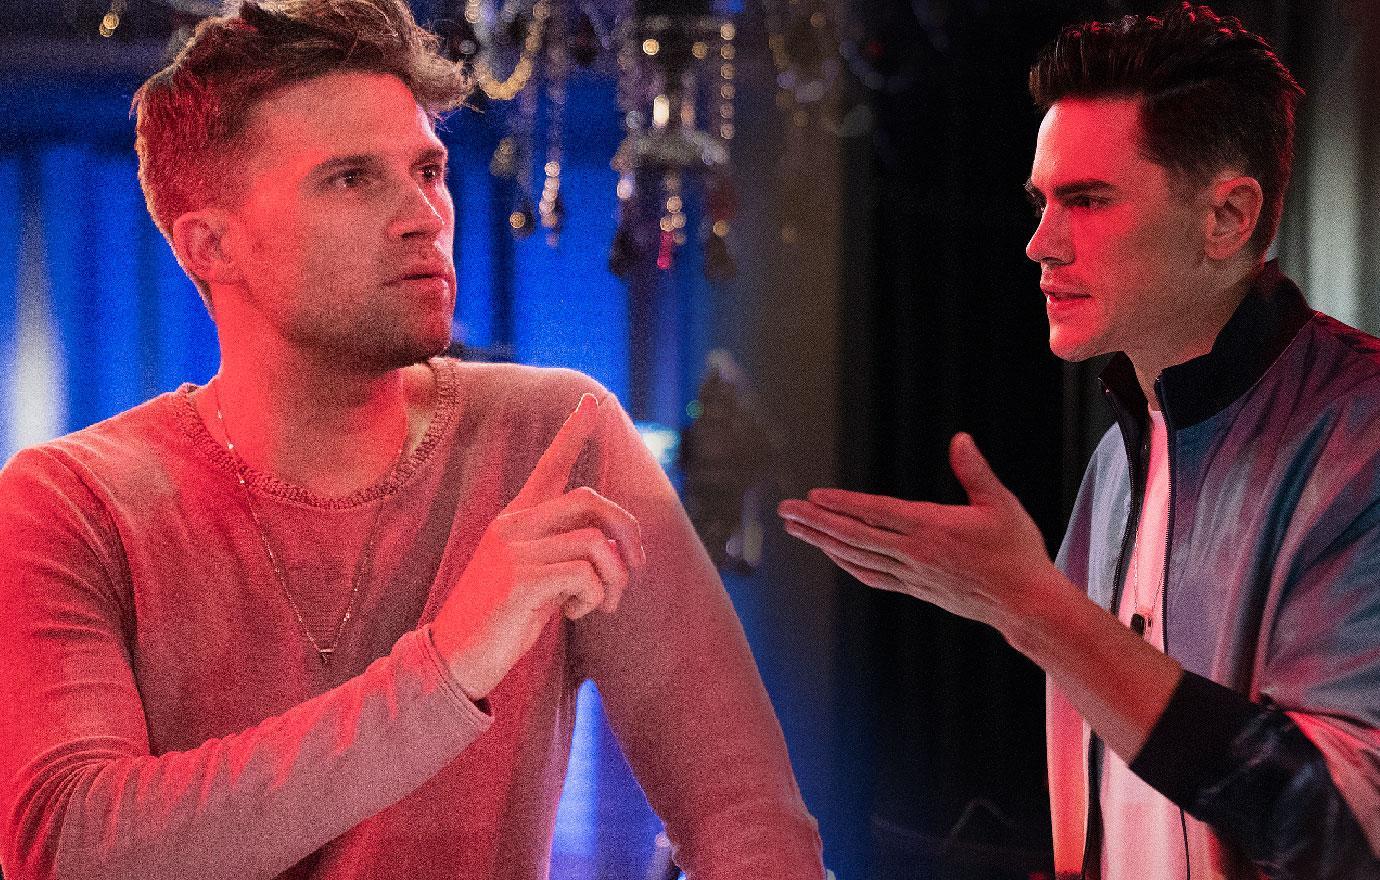 Vanderpump Rules Trailer Sparks Fly Between Tom Schwartz And Tom Sandoval